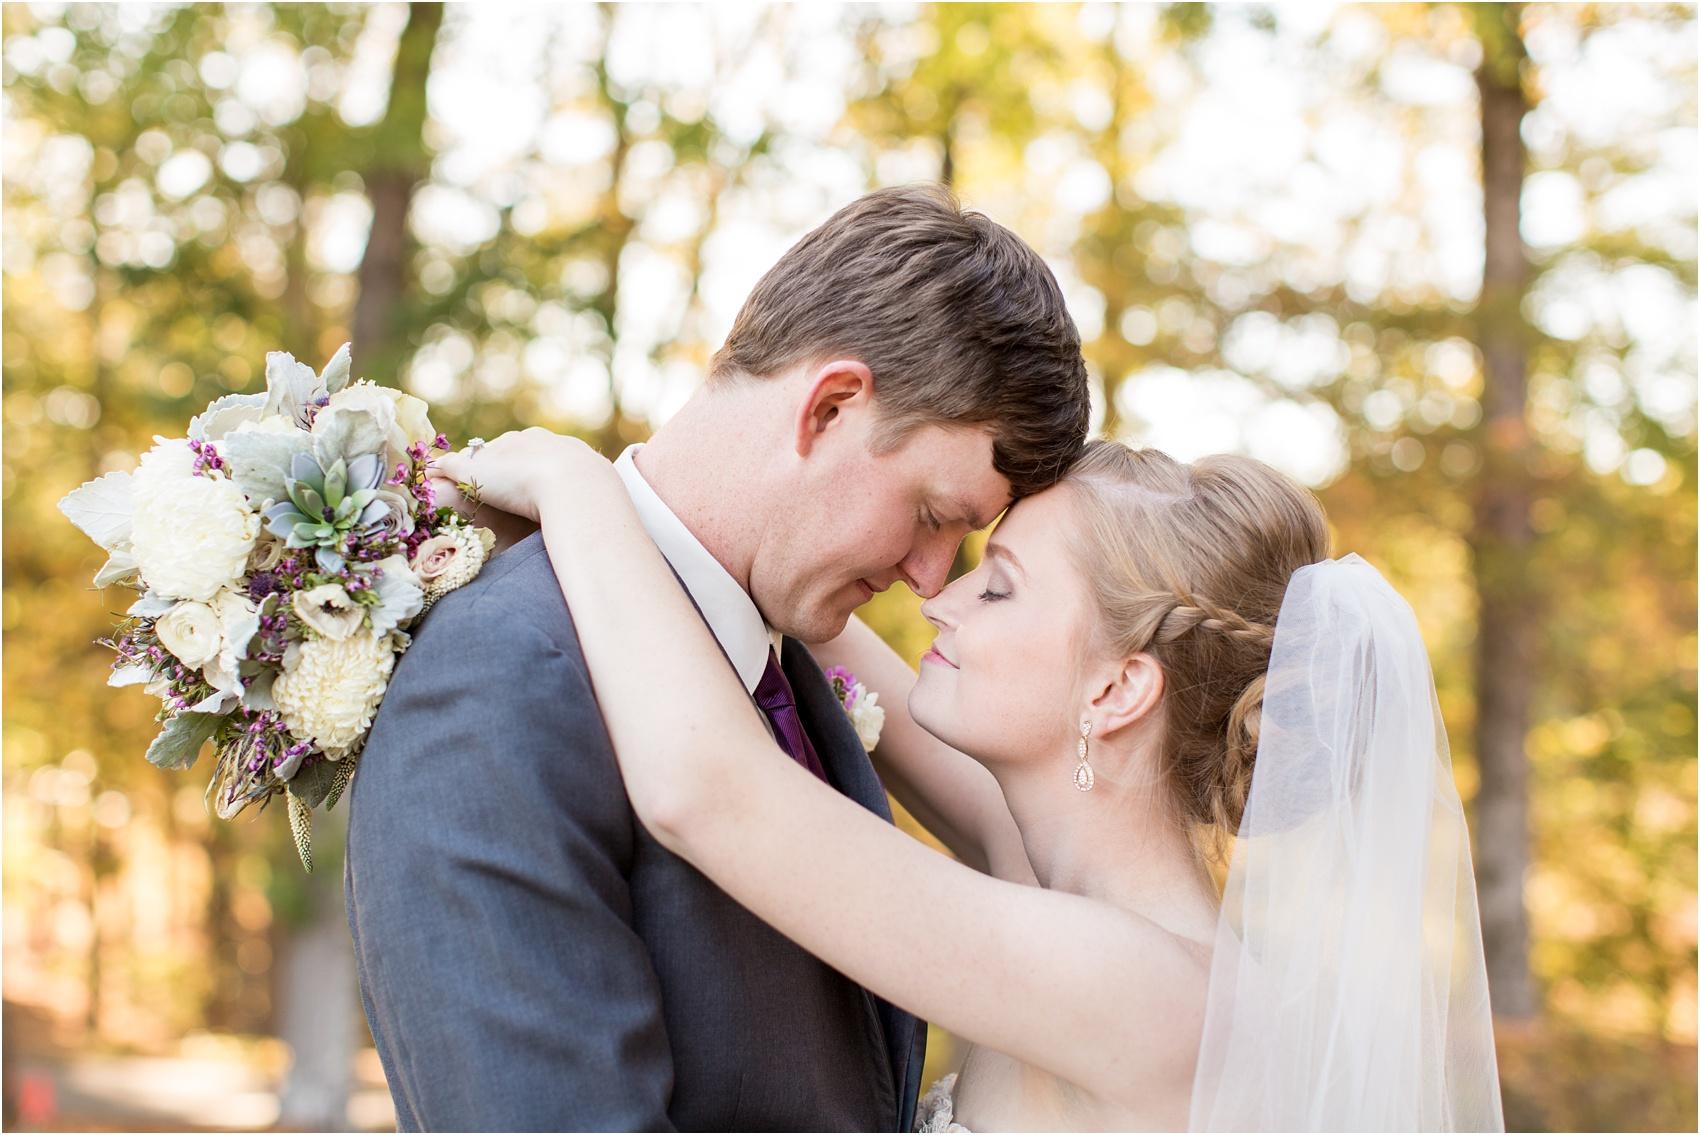 Savannah Eve Photography- Perkins Wedding- Blog-20.jpg